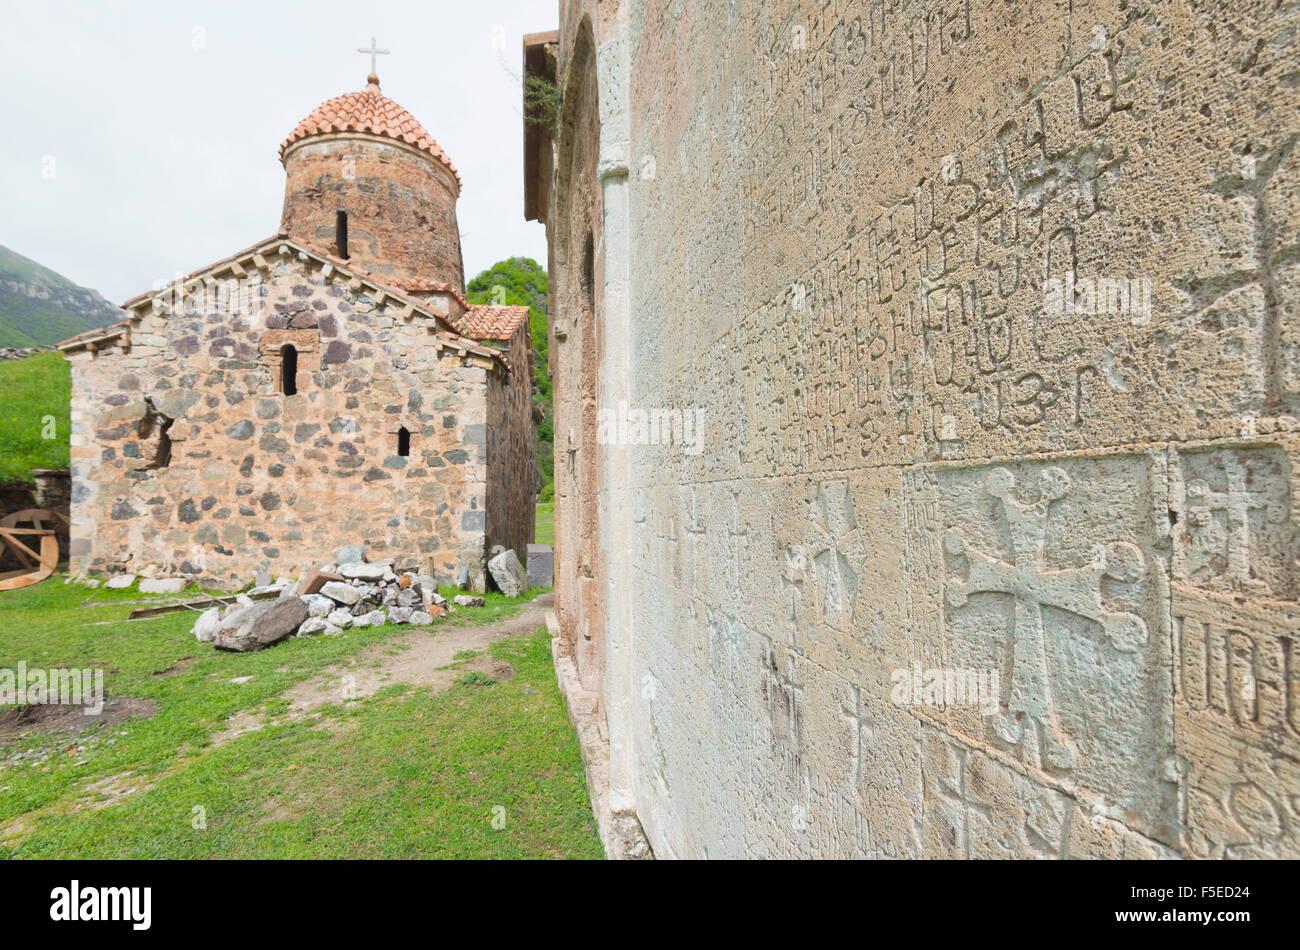 Dadivank Monastery, independent Armenian enclave officially within Azerbaijan, Nagorno-Karabakh, Armenia, Caucasus, - Stock Image